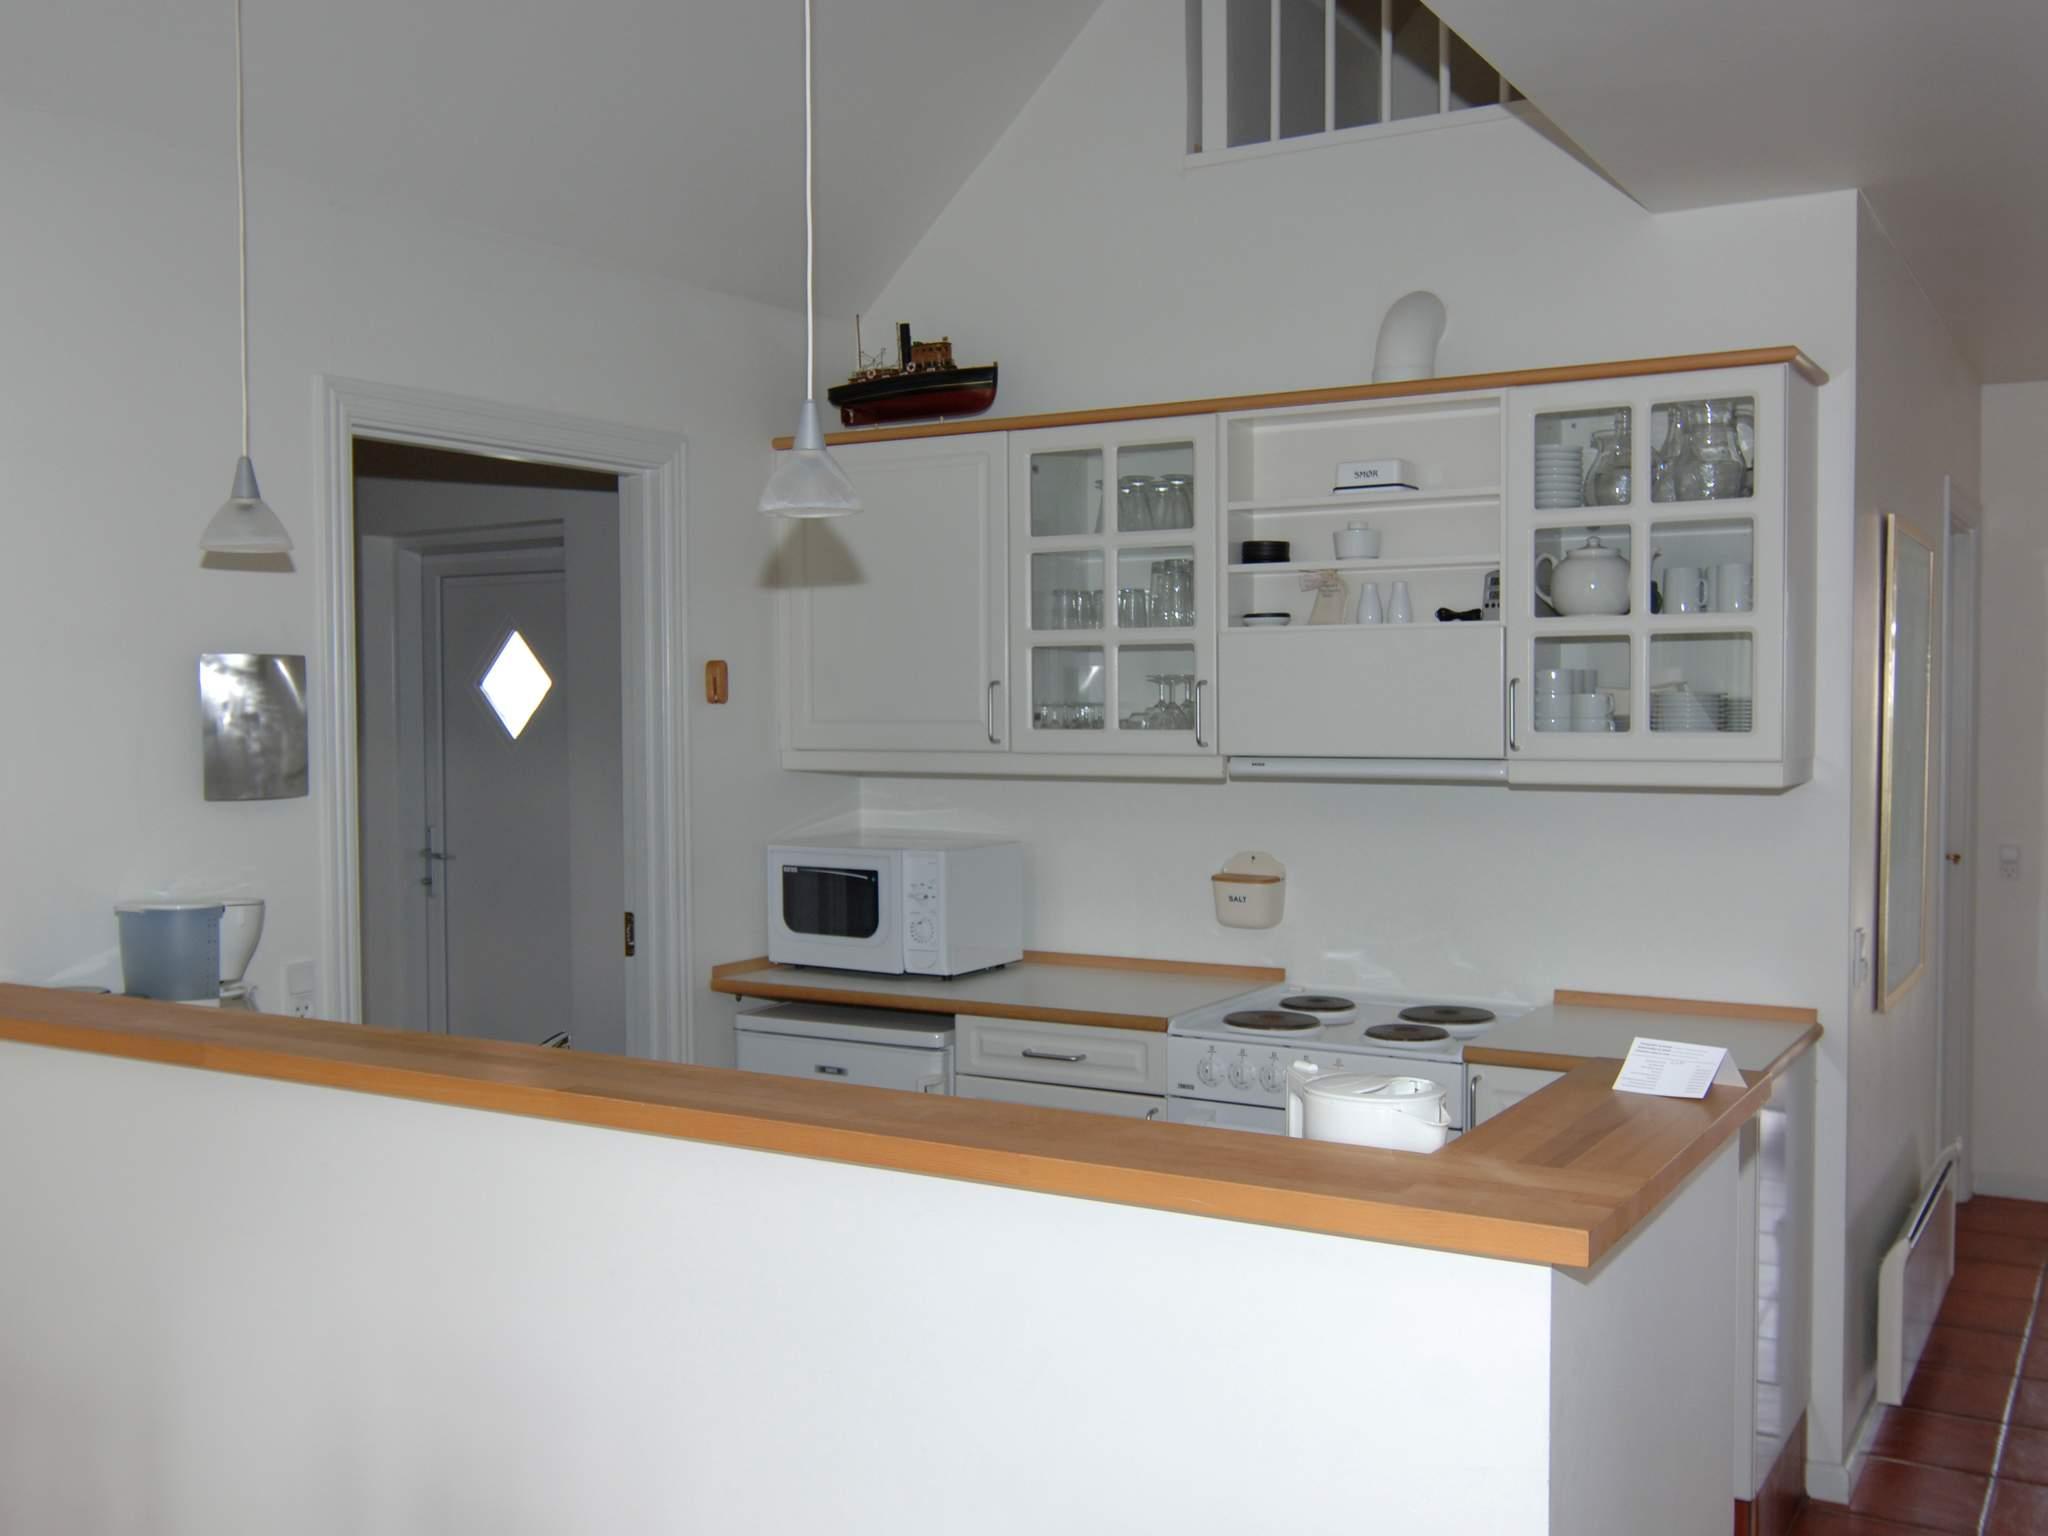 Ferienhaus Blåvand (241666), Blåvand, , Westjütland, Dänemark, Bild 3